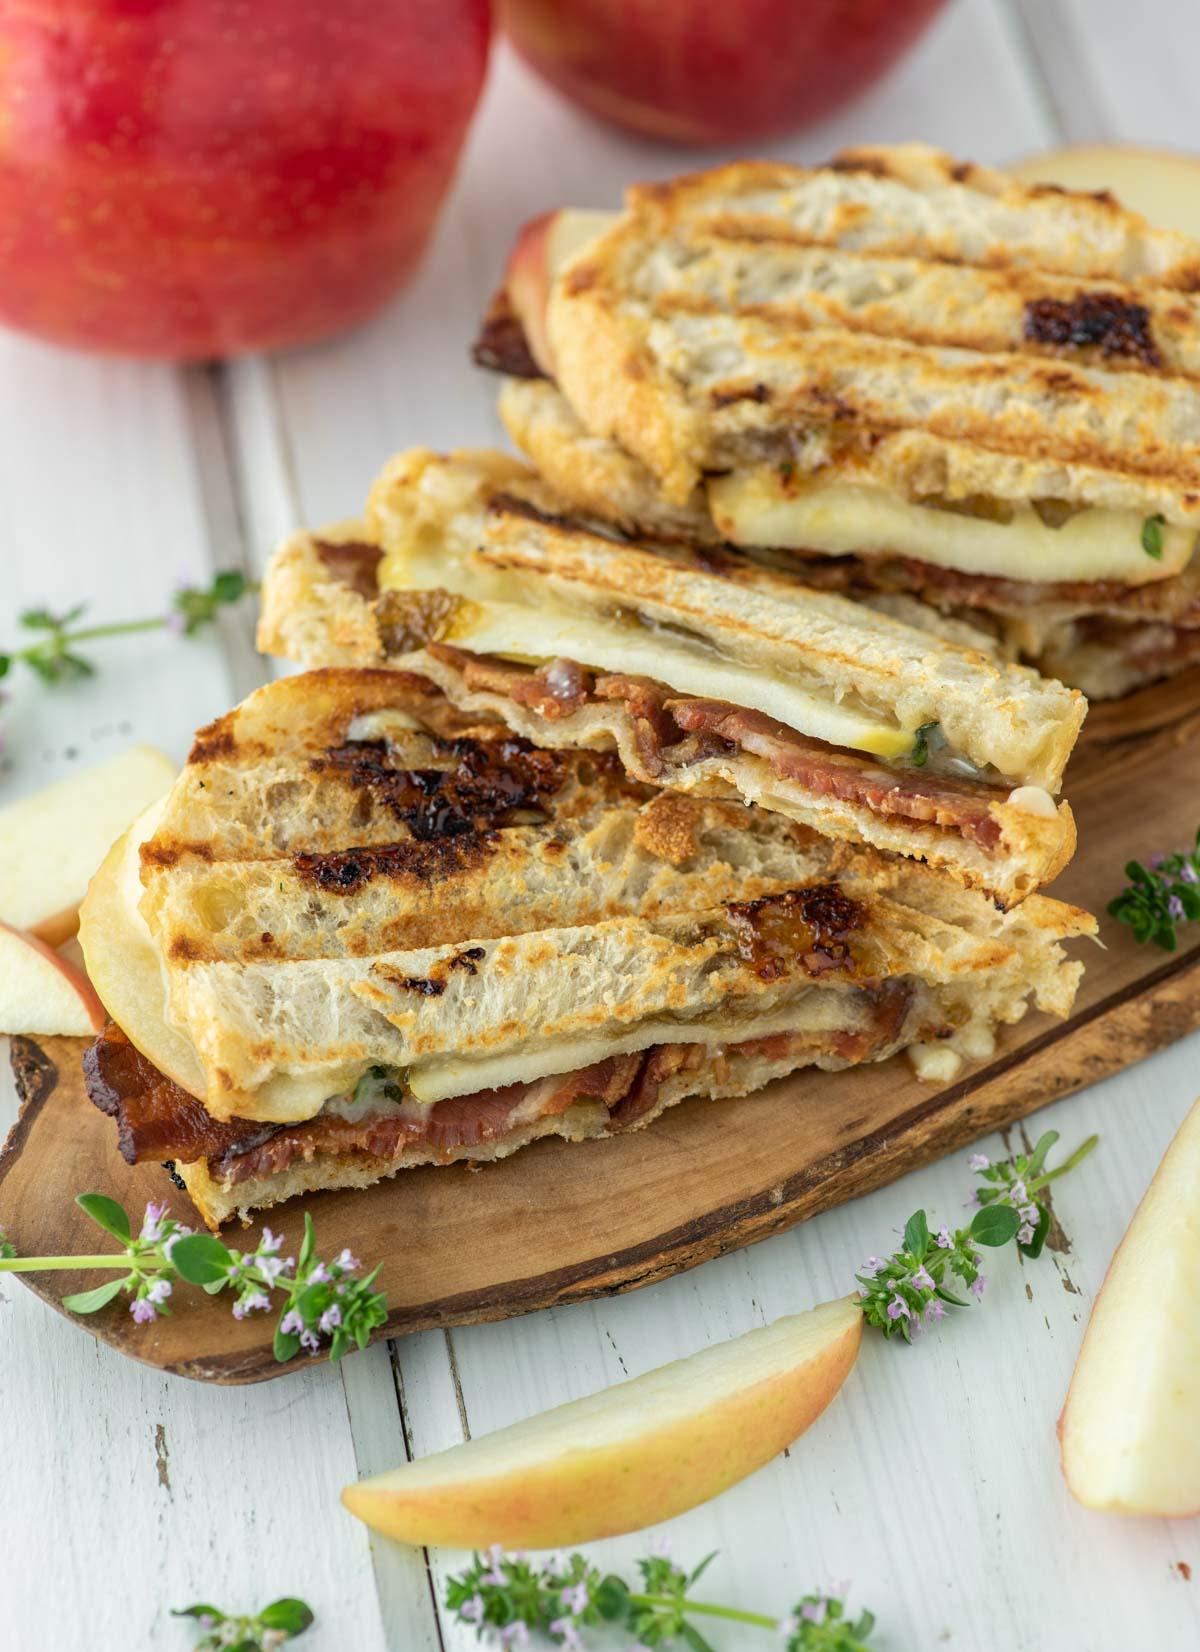 apple cheddar bacon paninis on wood board